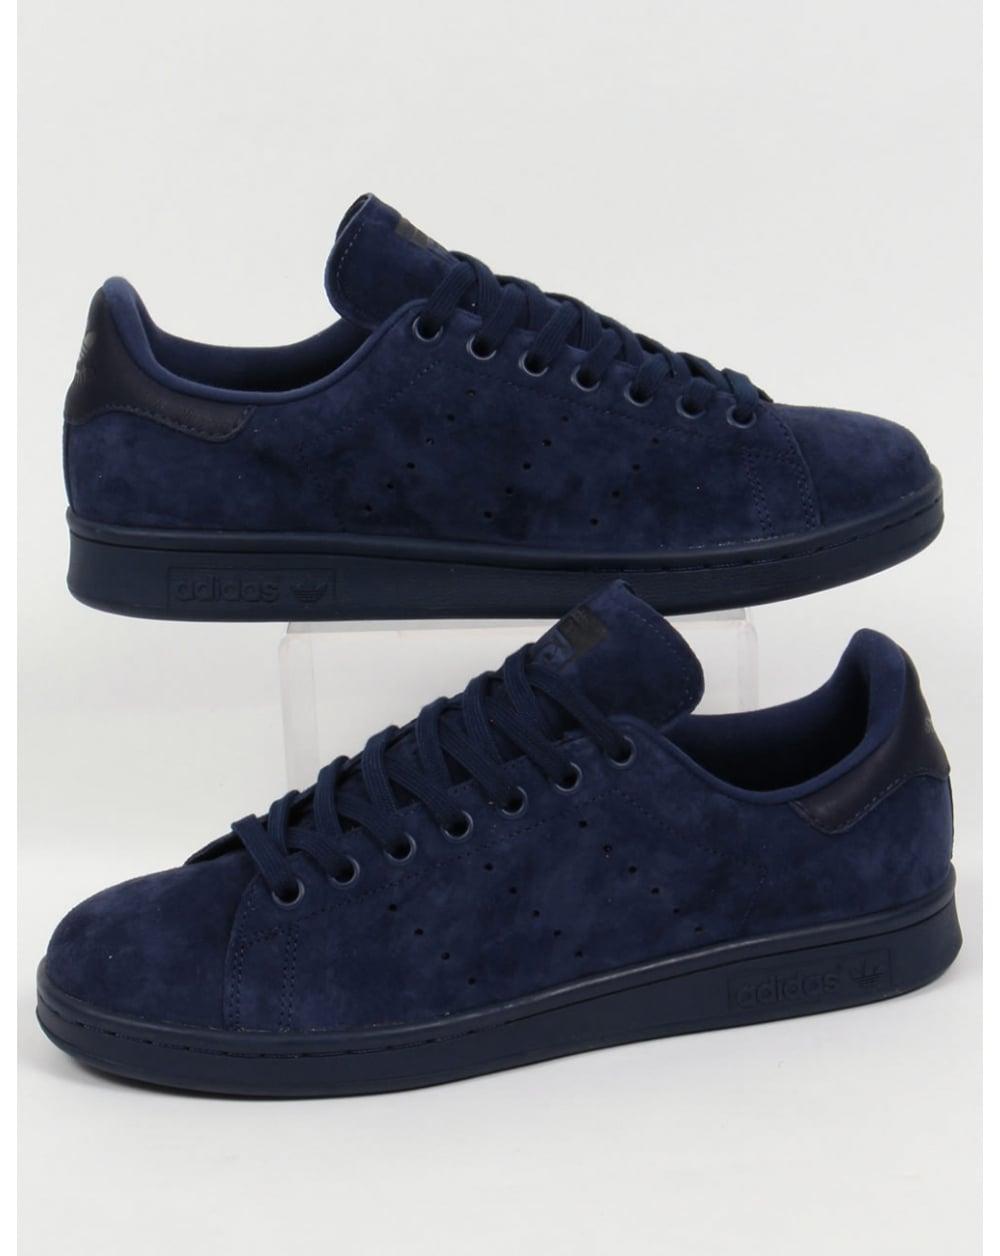 vhcke originals, mens, shoes, sneakers